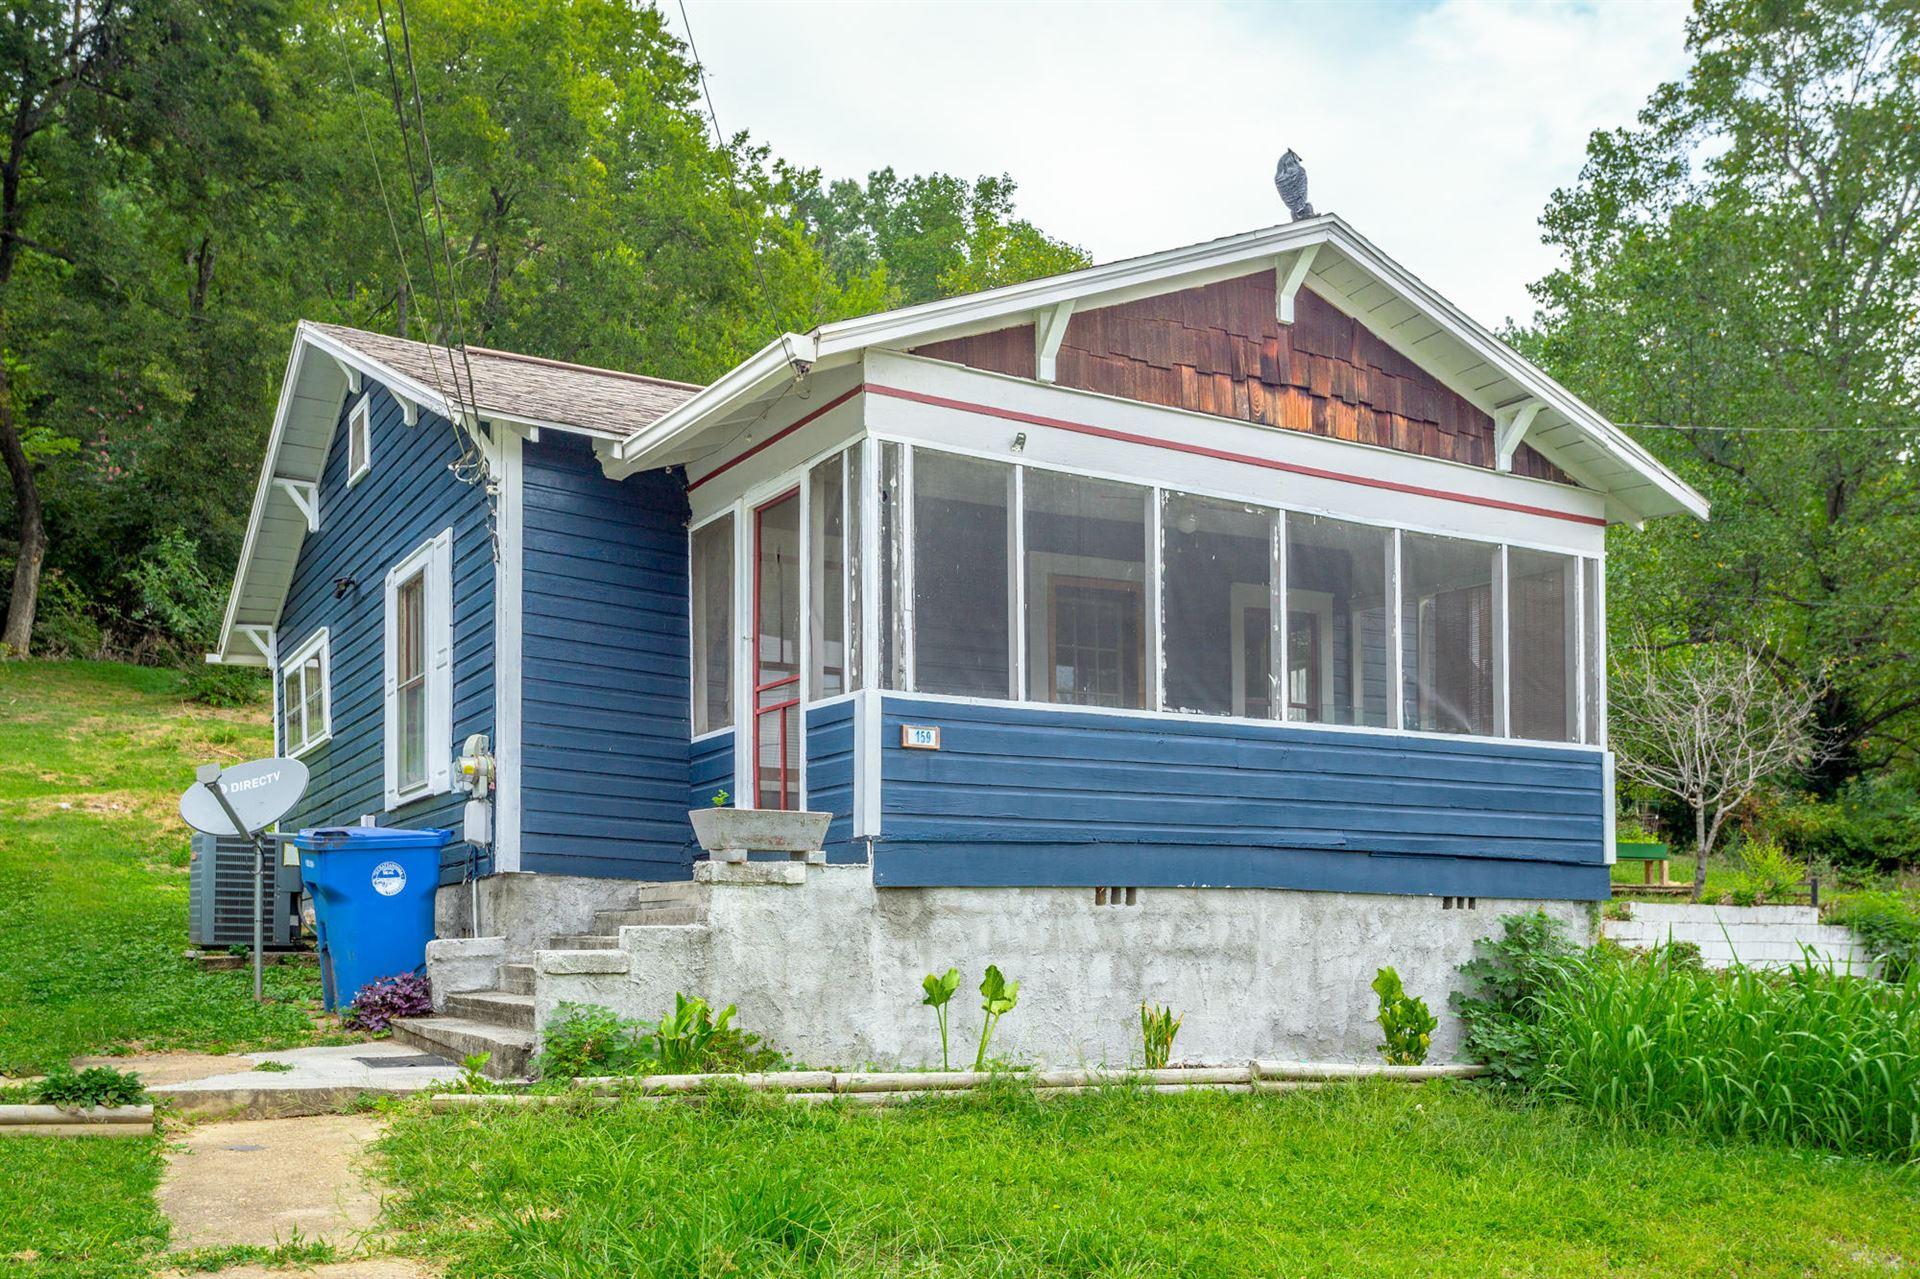 159 Signal Hills Dr, Chattanooga, TN 37405 - MLS#: 1324567